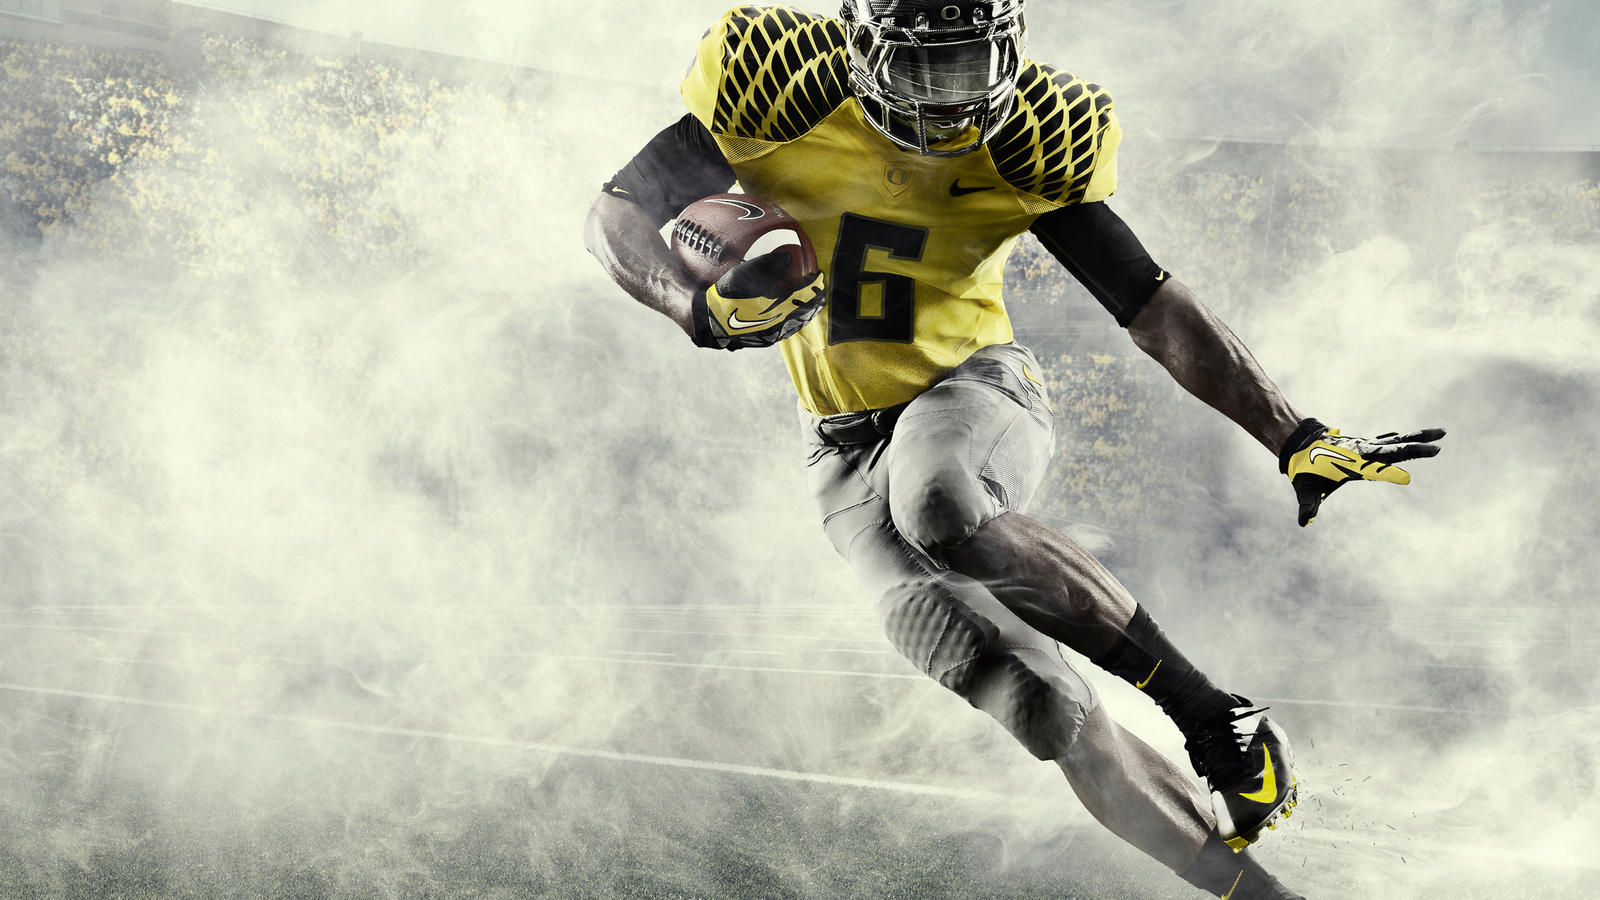 6362d4619 Nike Football 2012 Oregon Ducks Uniform - Innovation Shoulder.  Oregon Uniform FA12 Image FINAL